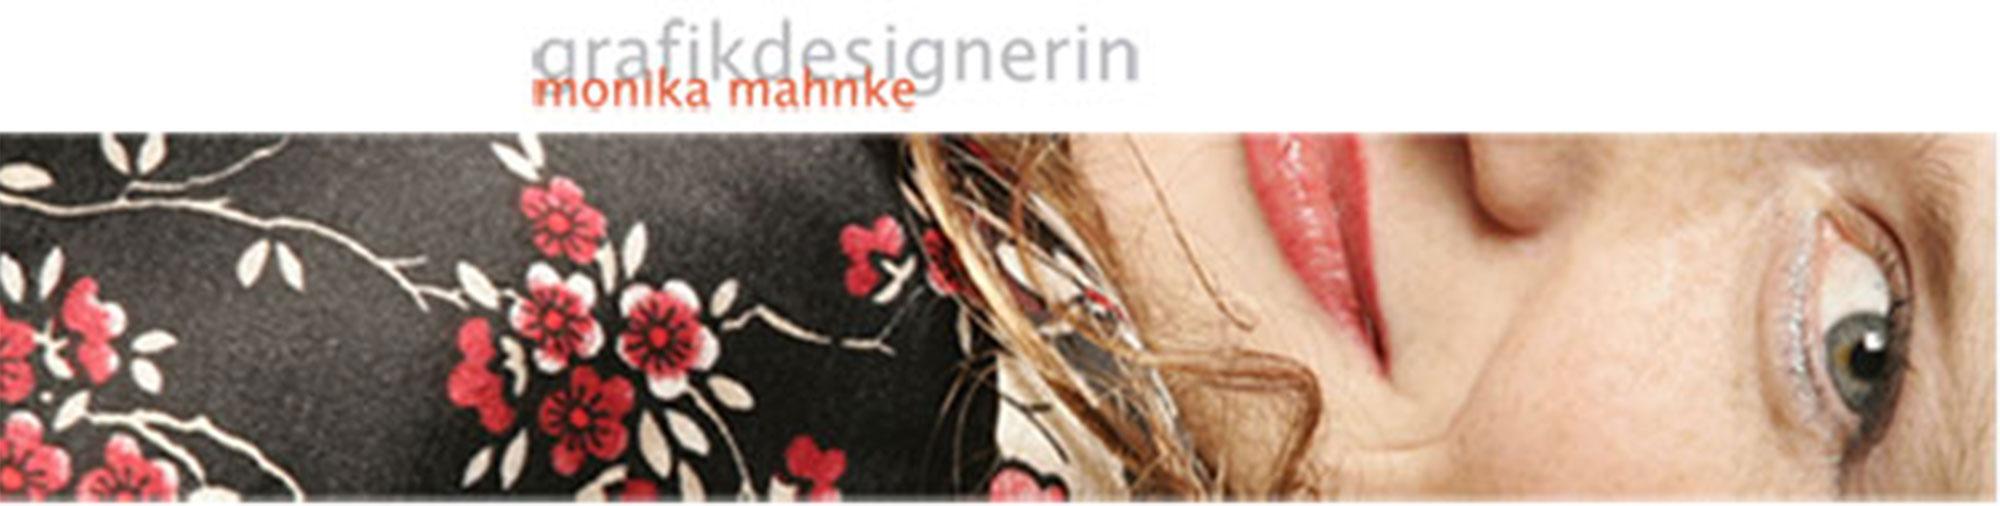 Monika Mahnke Grafikdesign